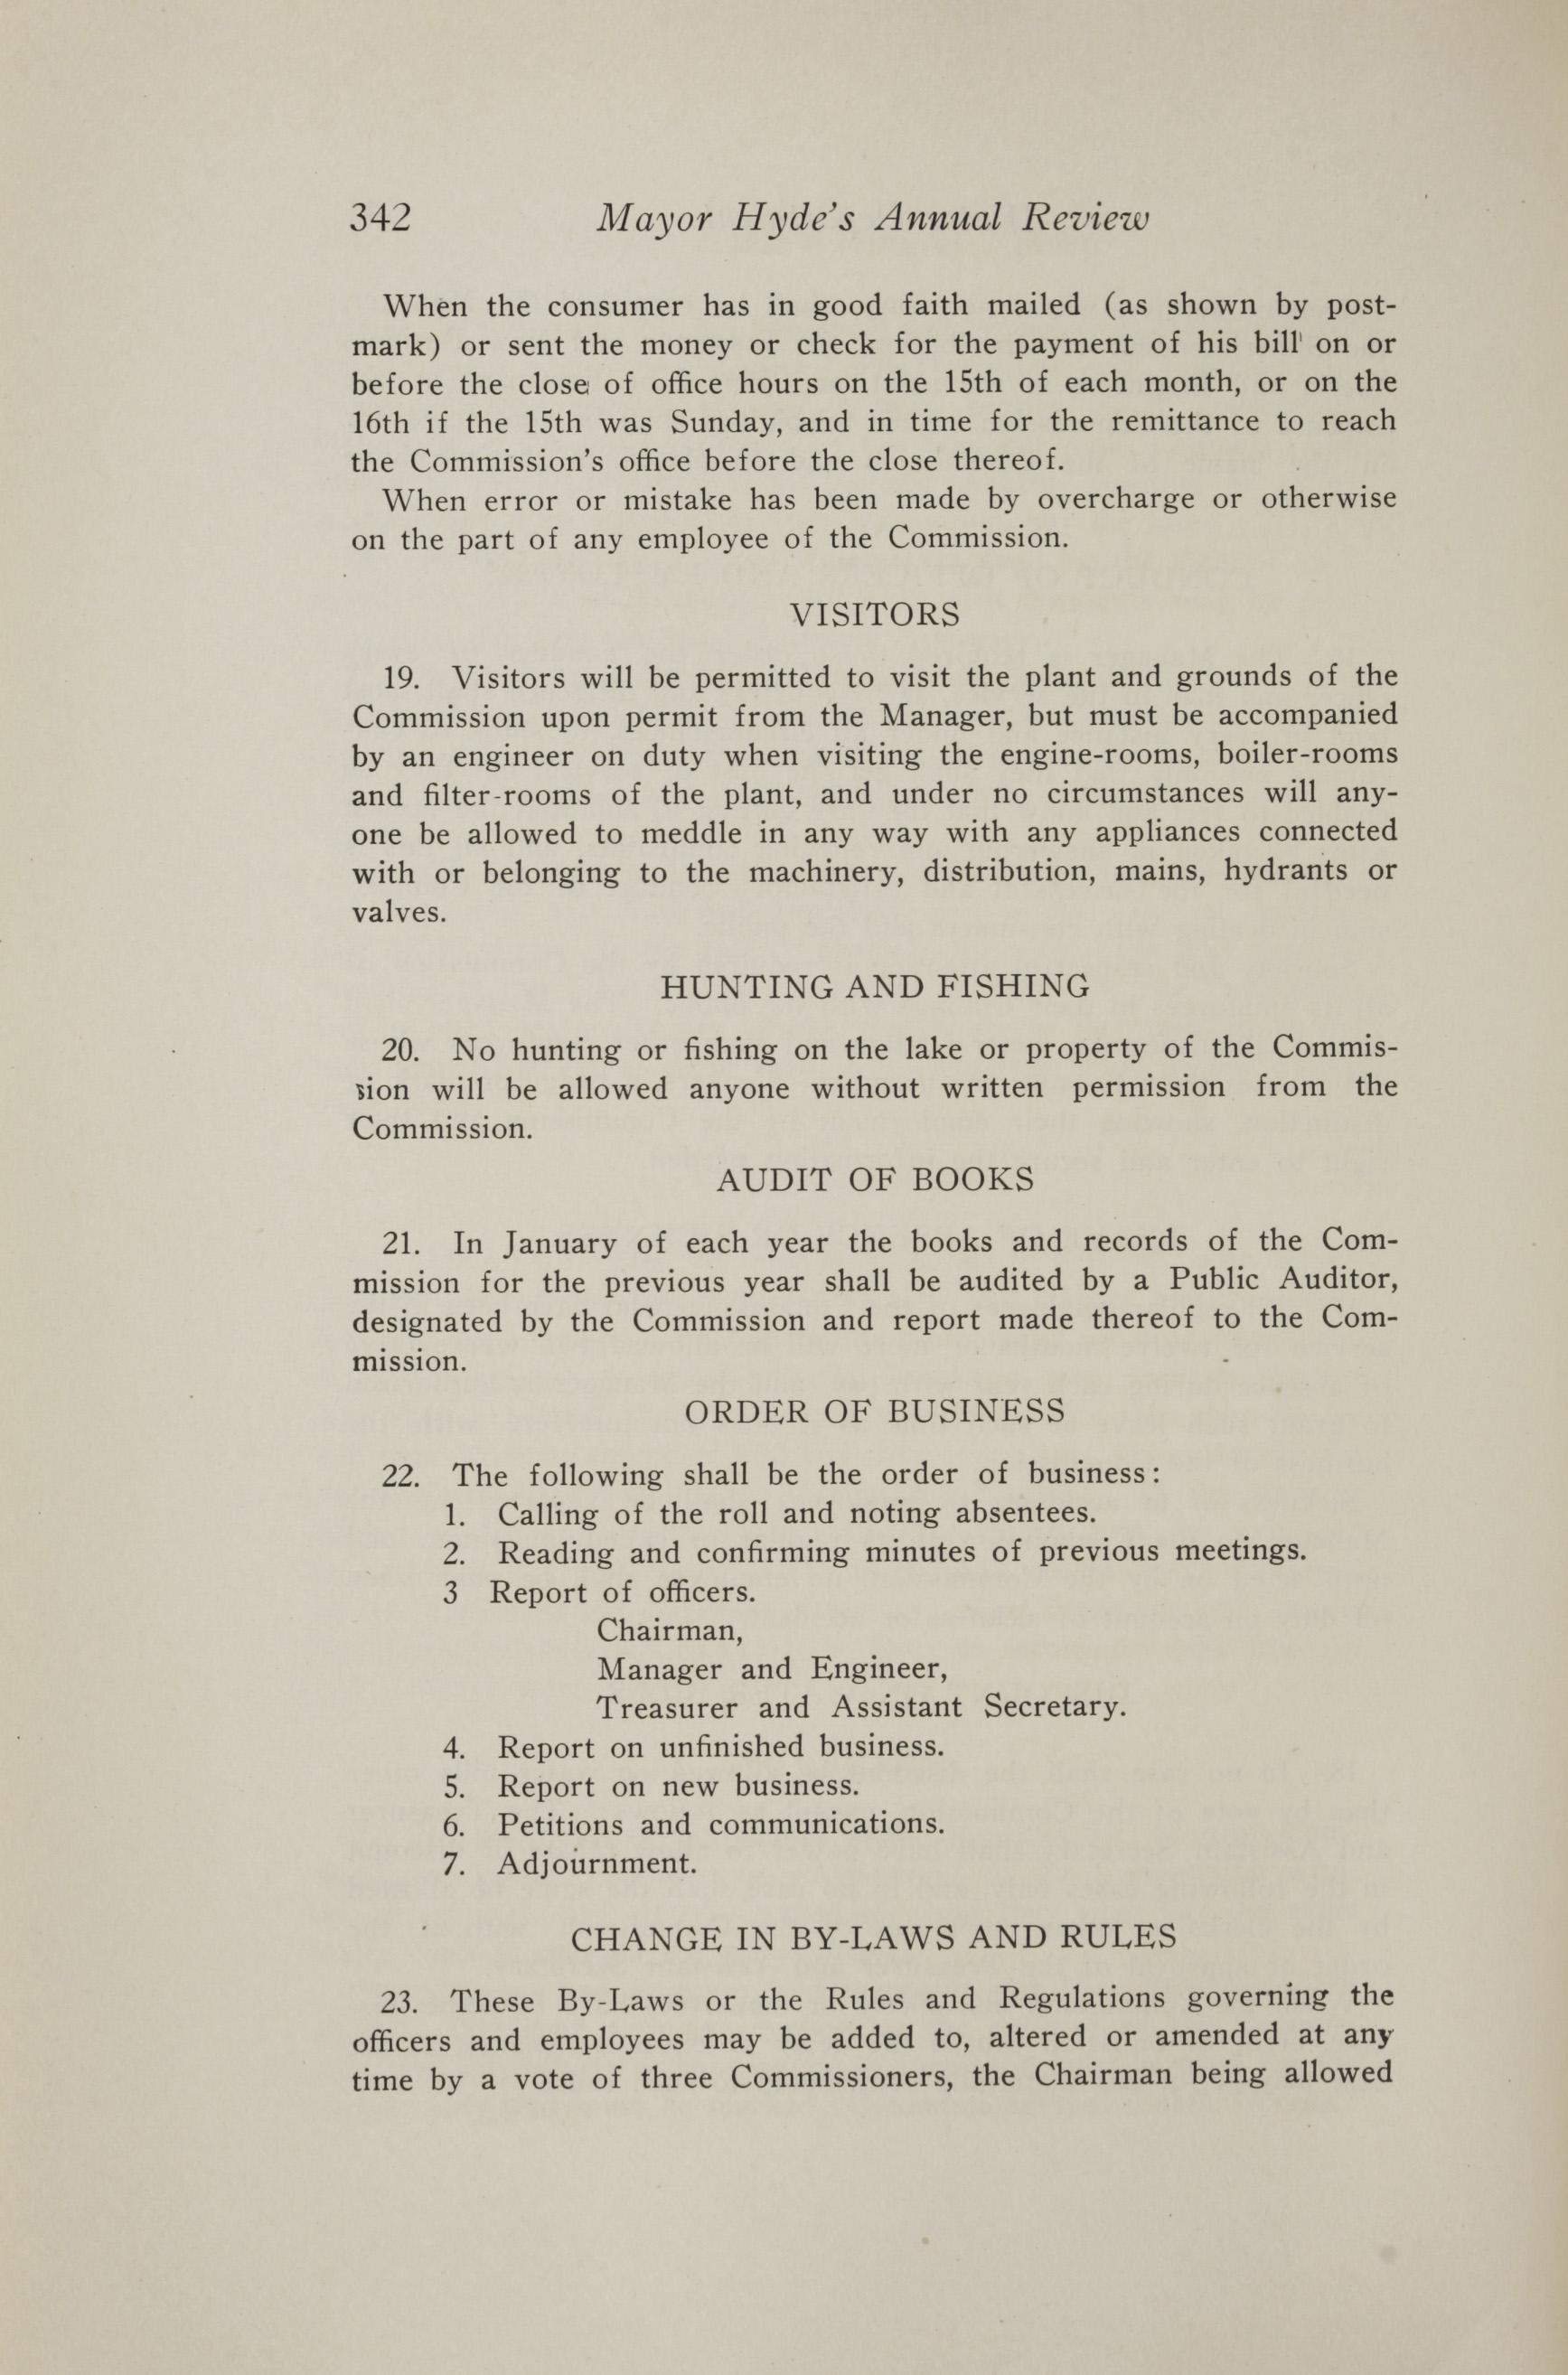 Charleston Yearbook, 1917, page 342